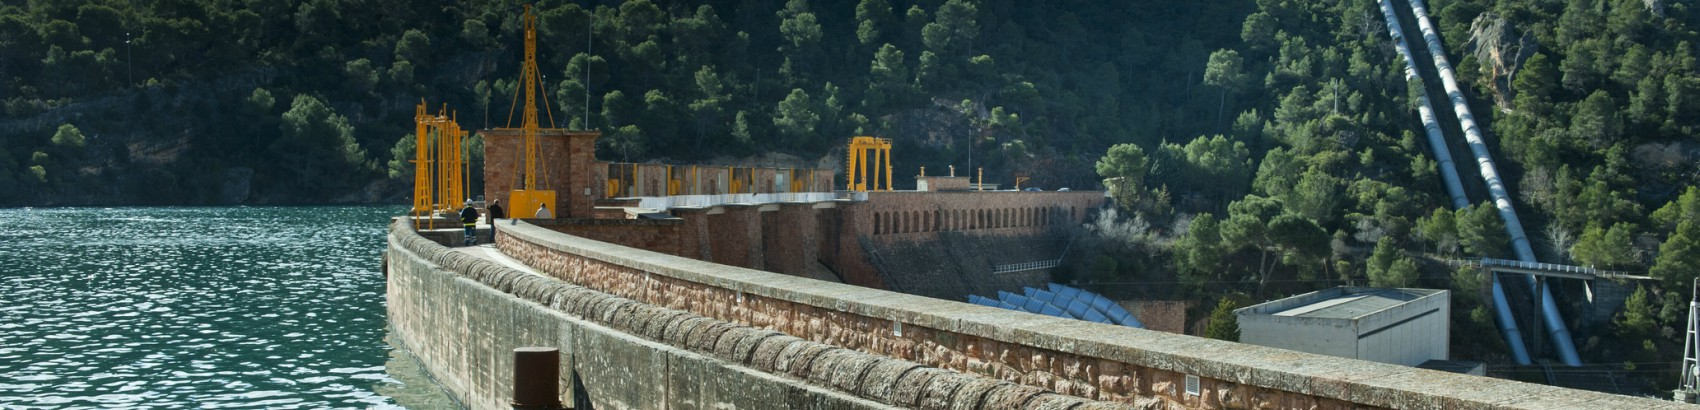 centra-hidroelectrica-bolarque-3